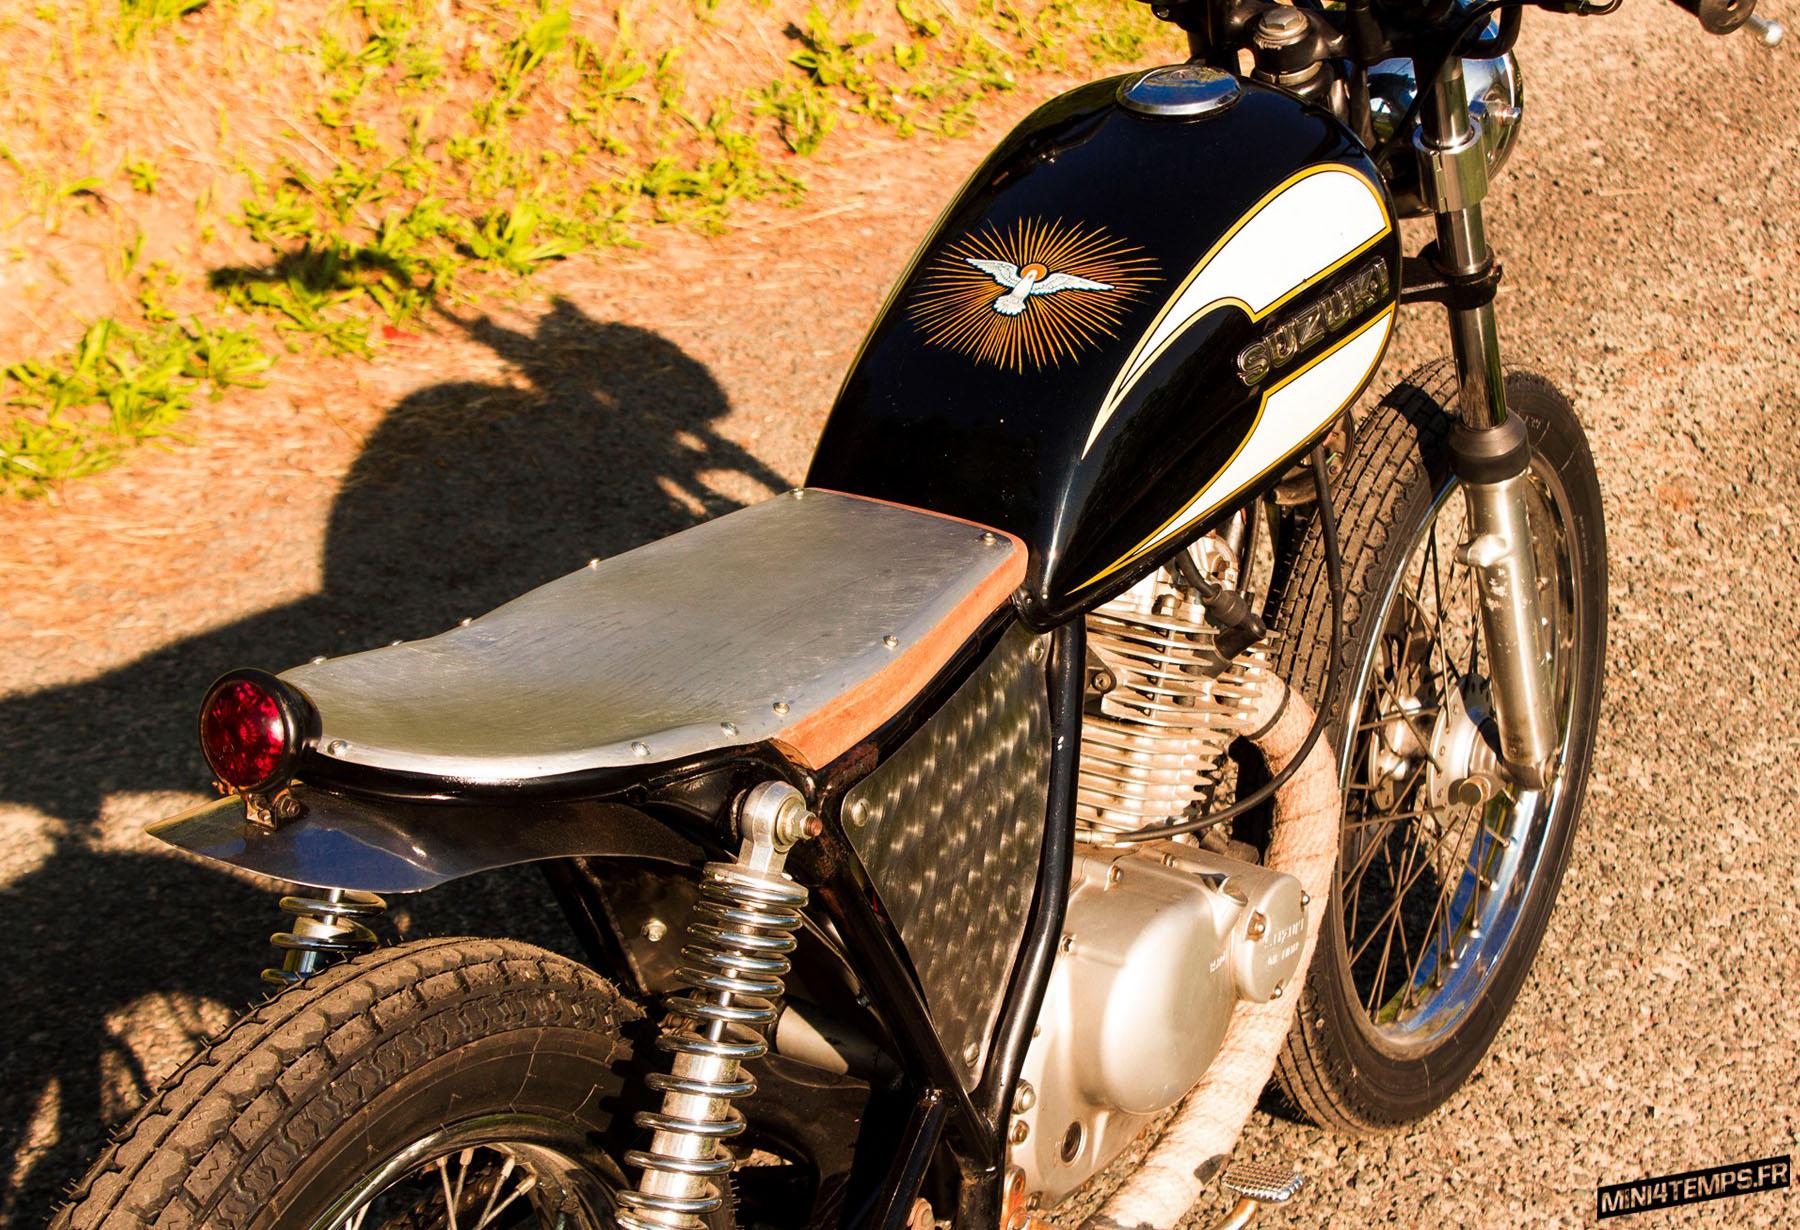 Suzuki GN125 by Somp777 - mini4temps.fr